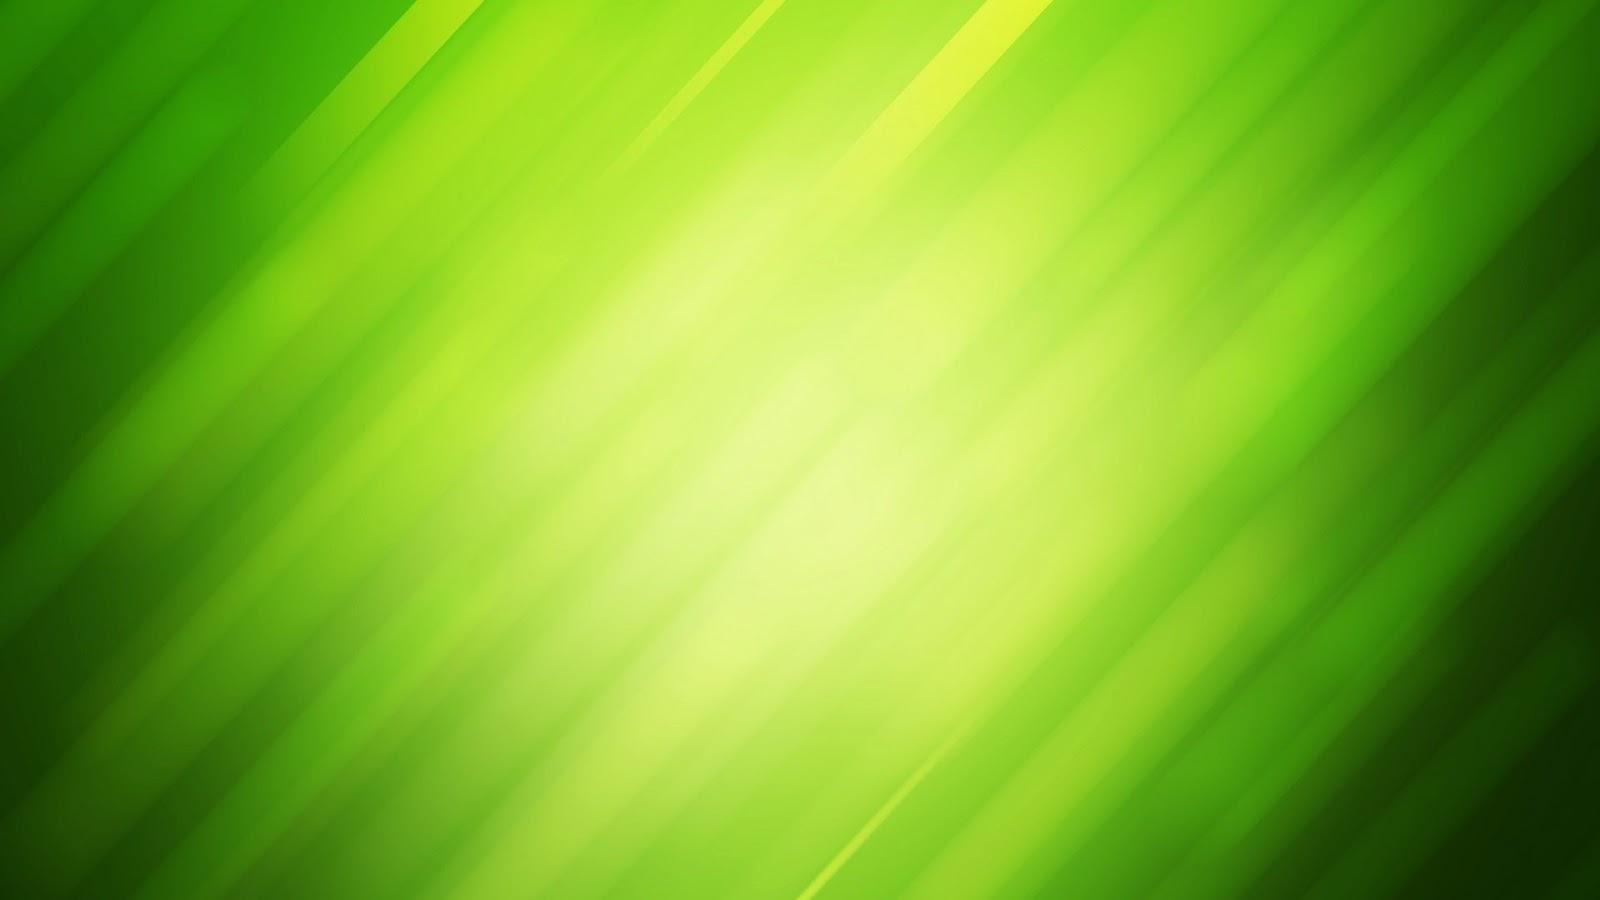 Background Warna Hijau Muda - Koleksi Gambar HD